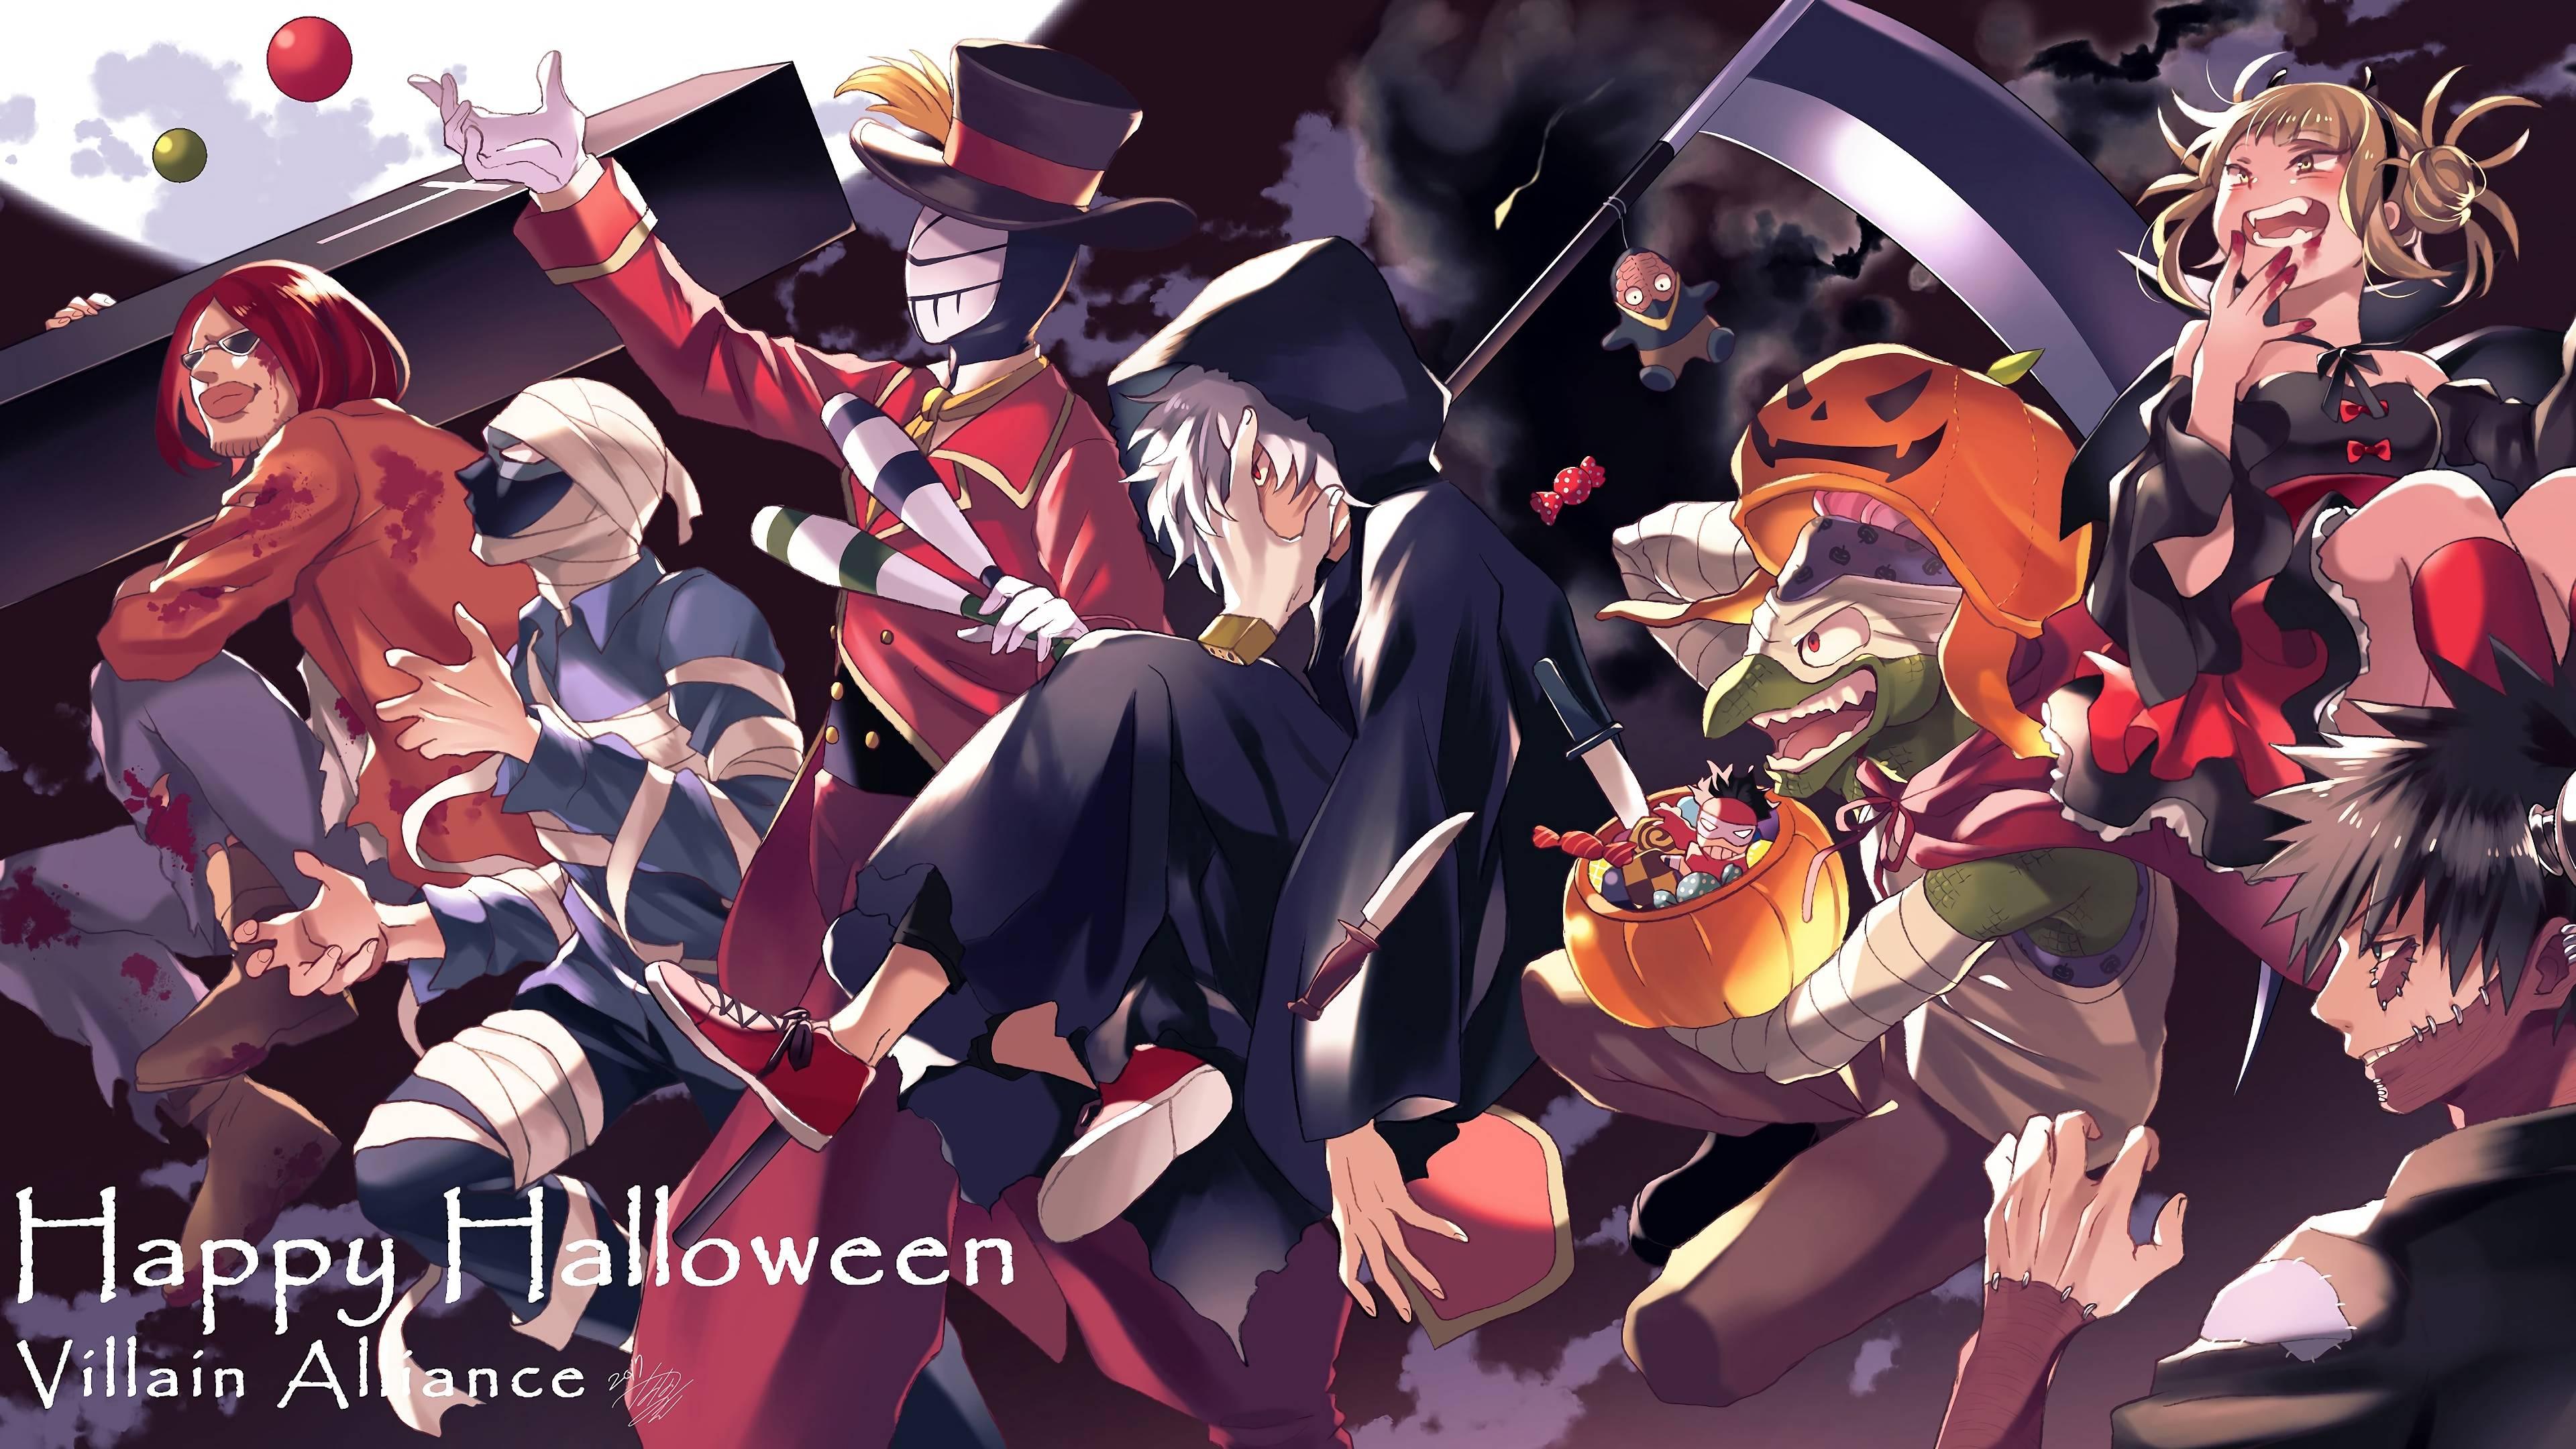 3840x2160 My Hero Academia League of Villains Vanguard Action Squad Happy